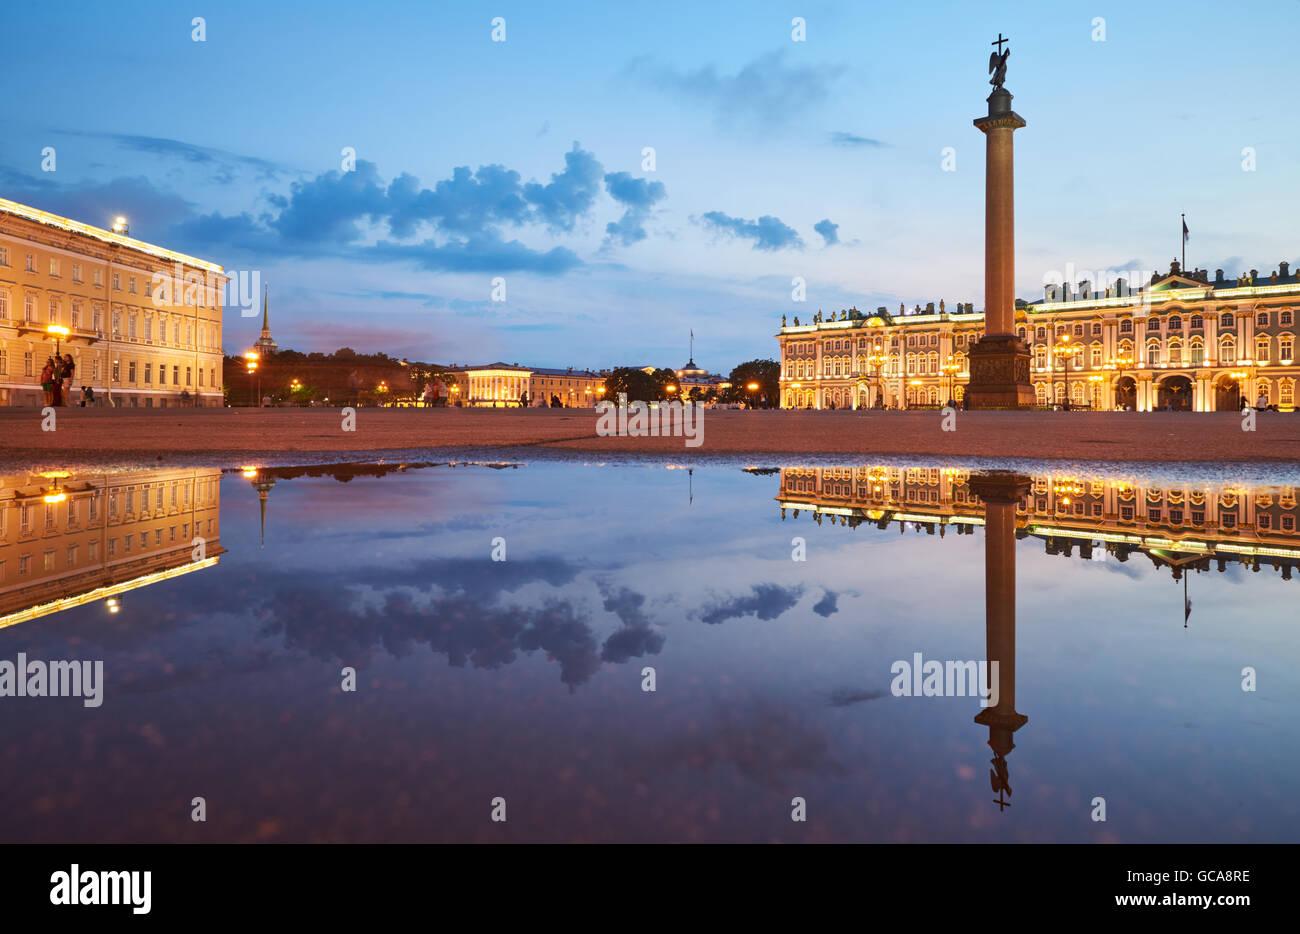 Russia, Saint-Petersburg, 03 July 2016: Palace Square with night illumination, Winter Palace, Hermitage, Alexander - Stock Image